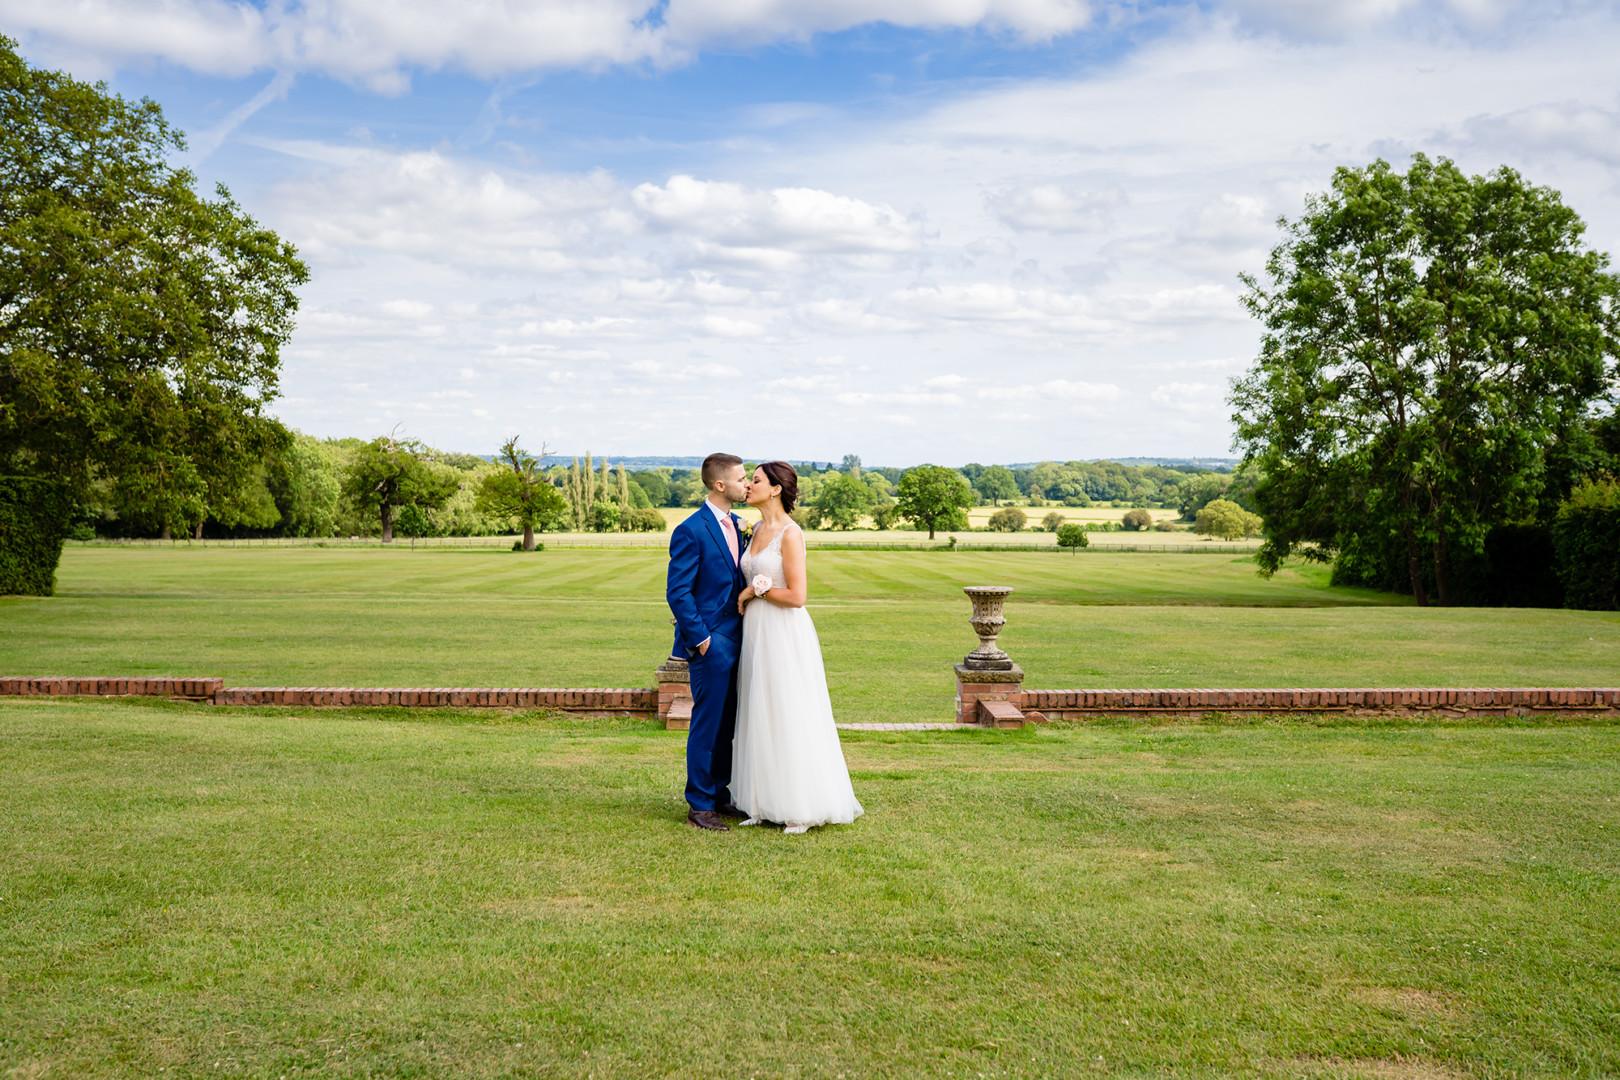 bride and groom at Micklefield Hall wedding venue in hertfordshire